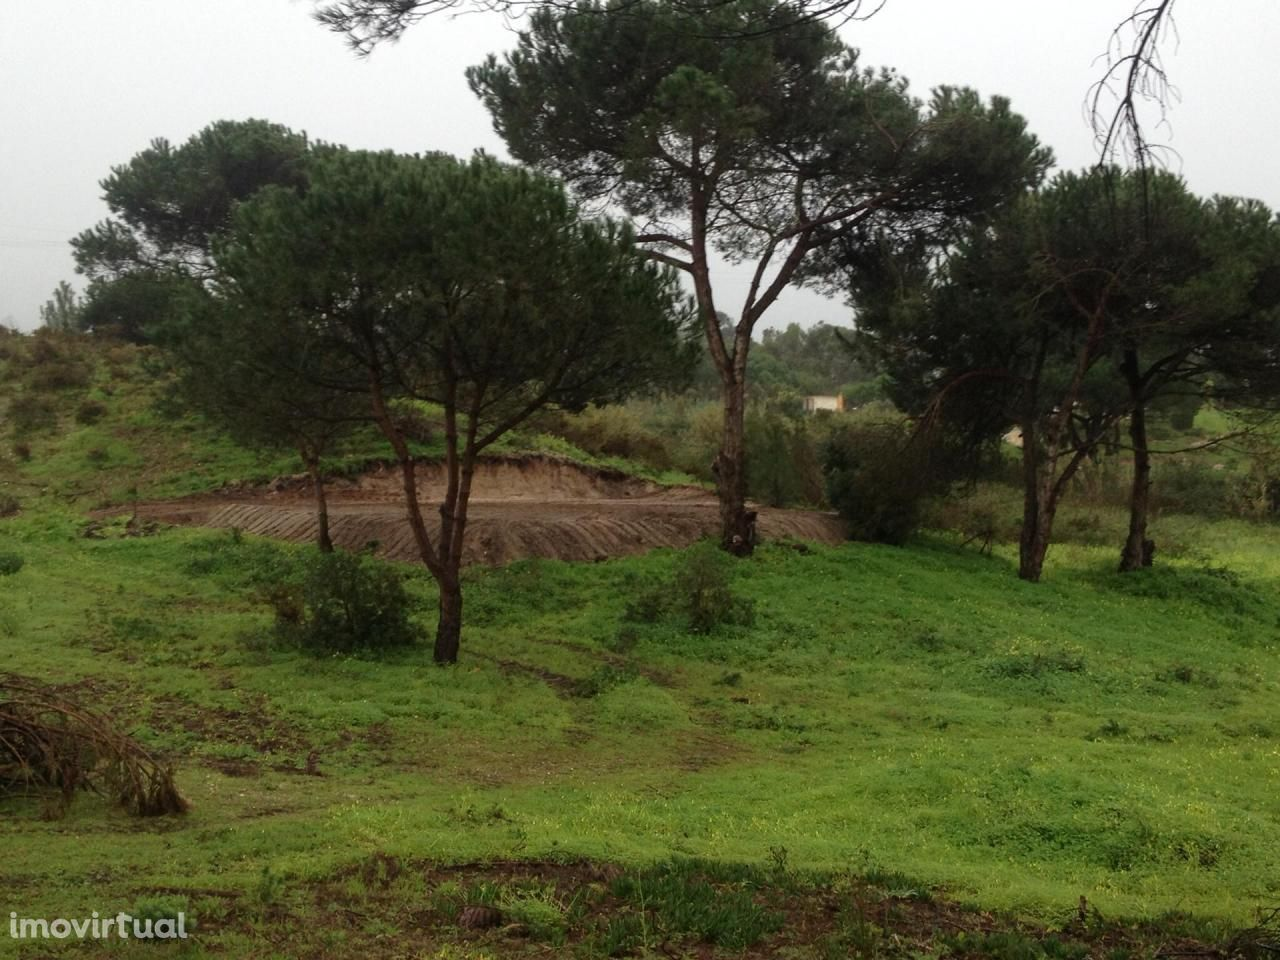 Terreno para comprar, Castelo (Sesimbra), Sesimbra, Setúbal - Foto 20